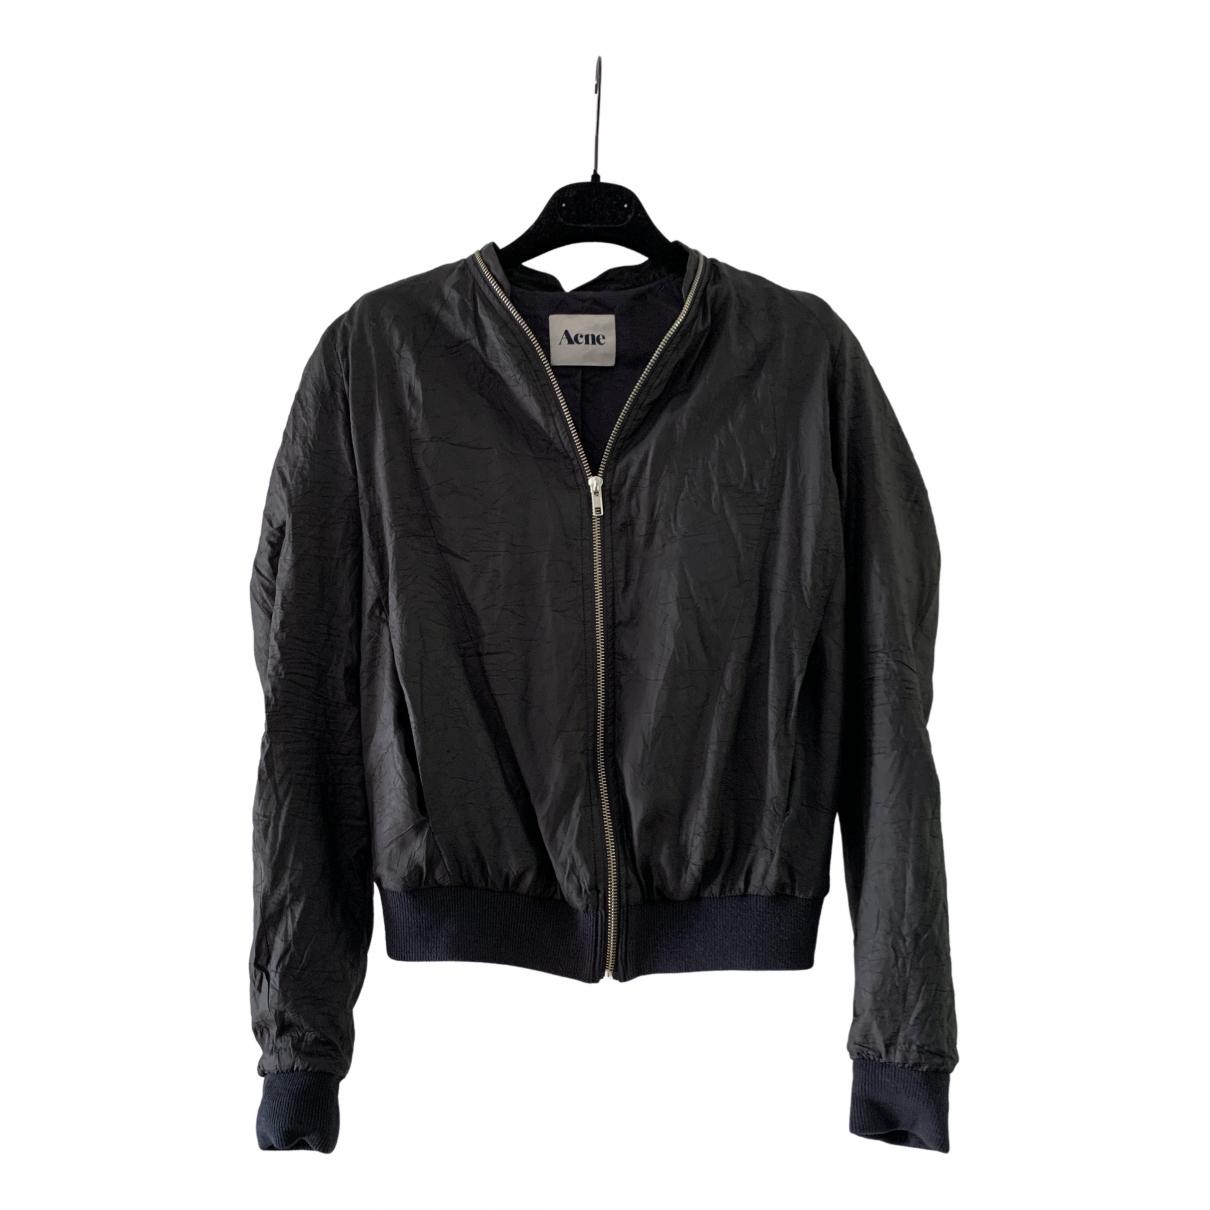 Acne Studios \N Navy jacket for Women 36 FR